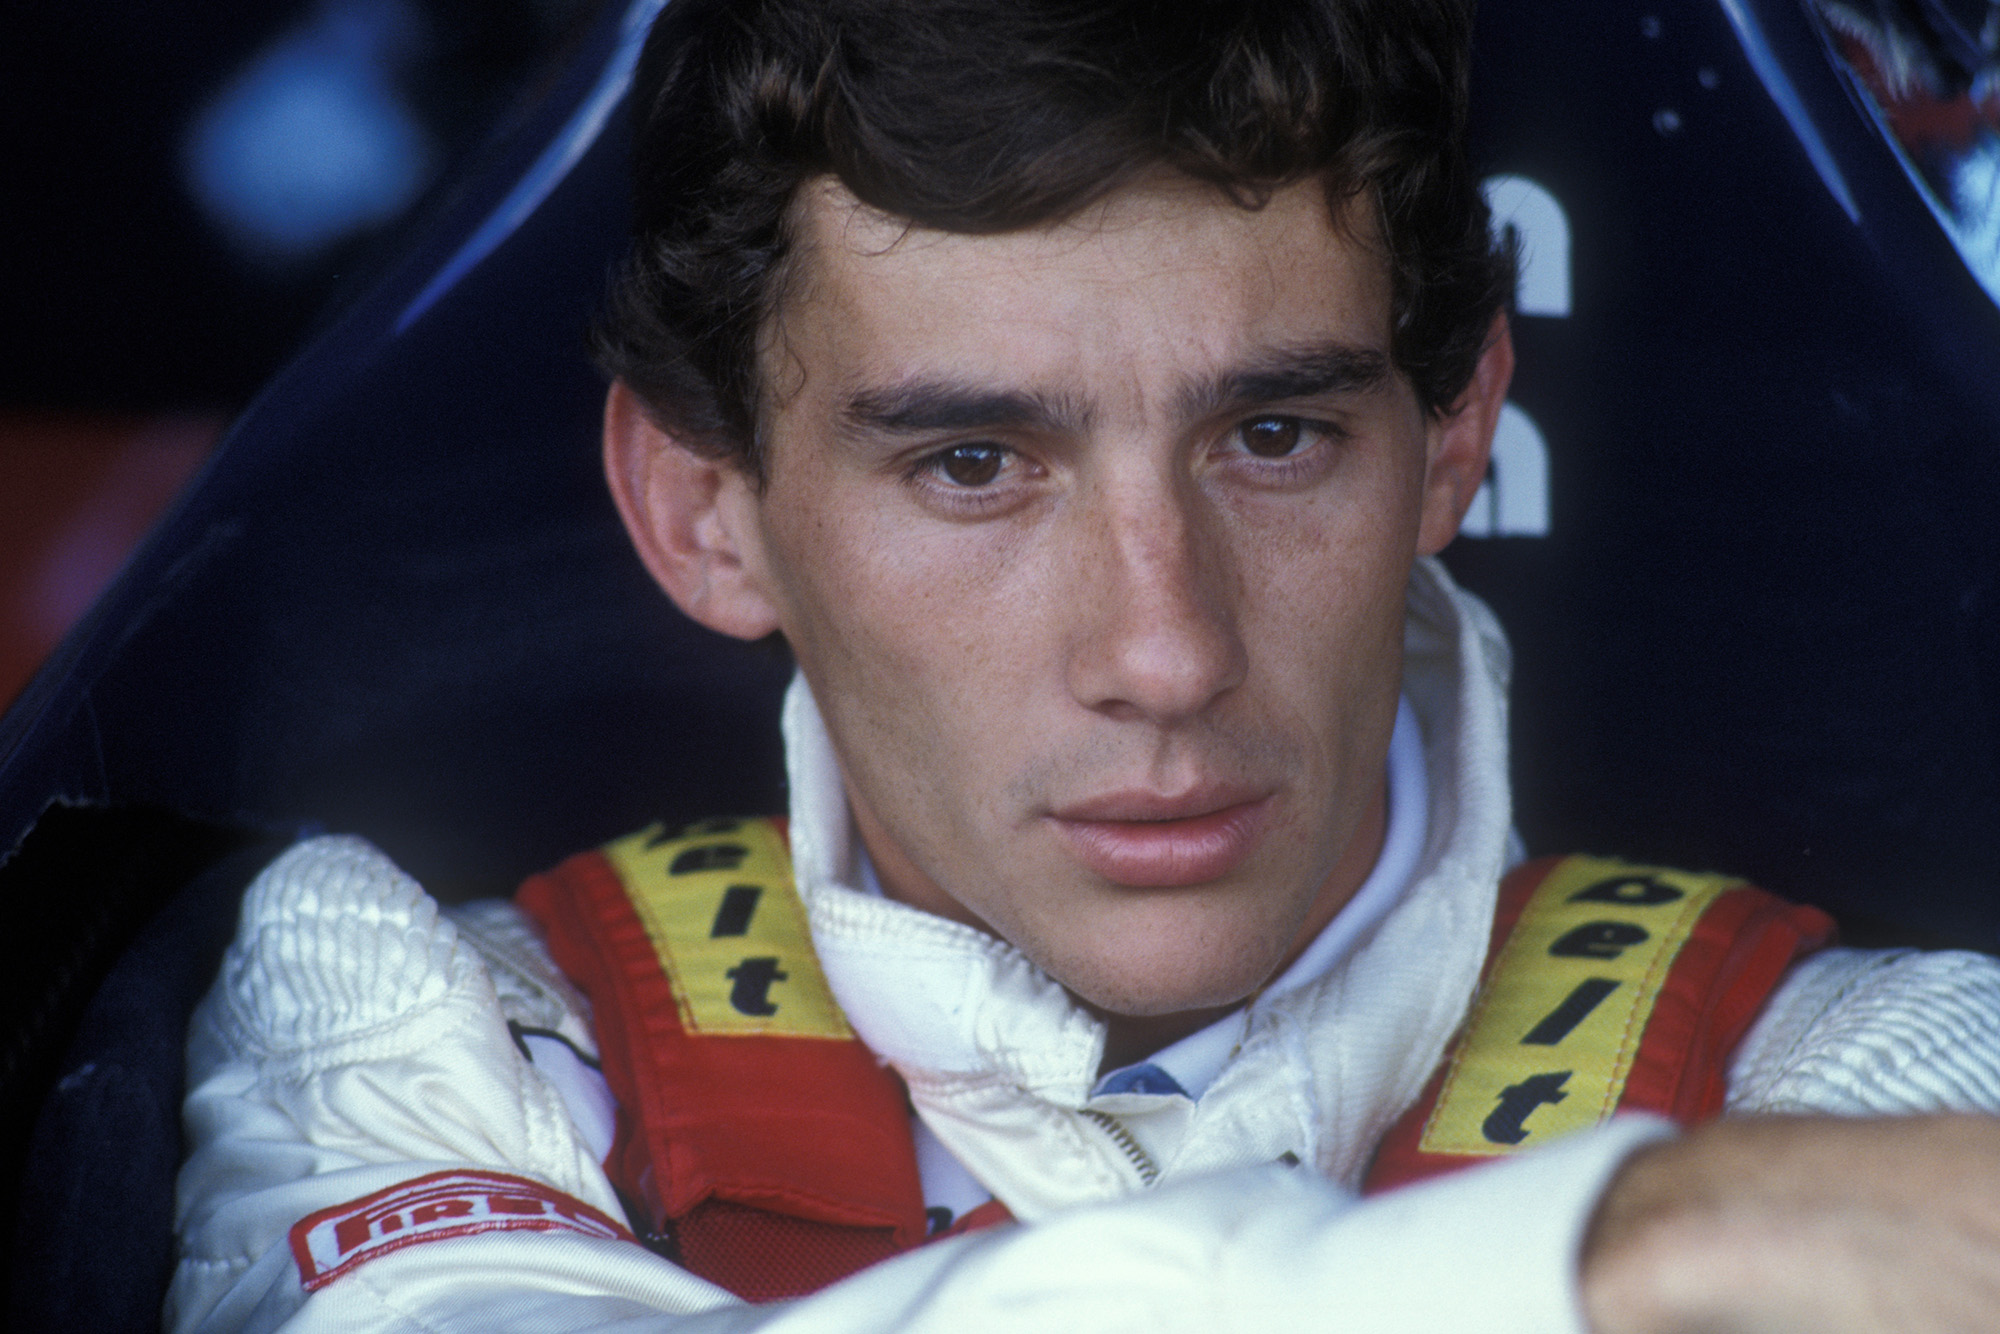 3. Senna before the 1984 Brazilian Grand Prix GPPjpg